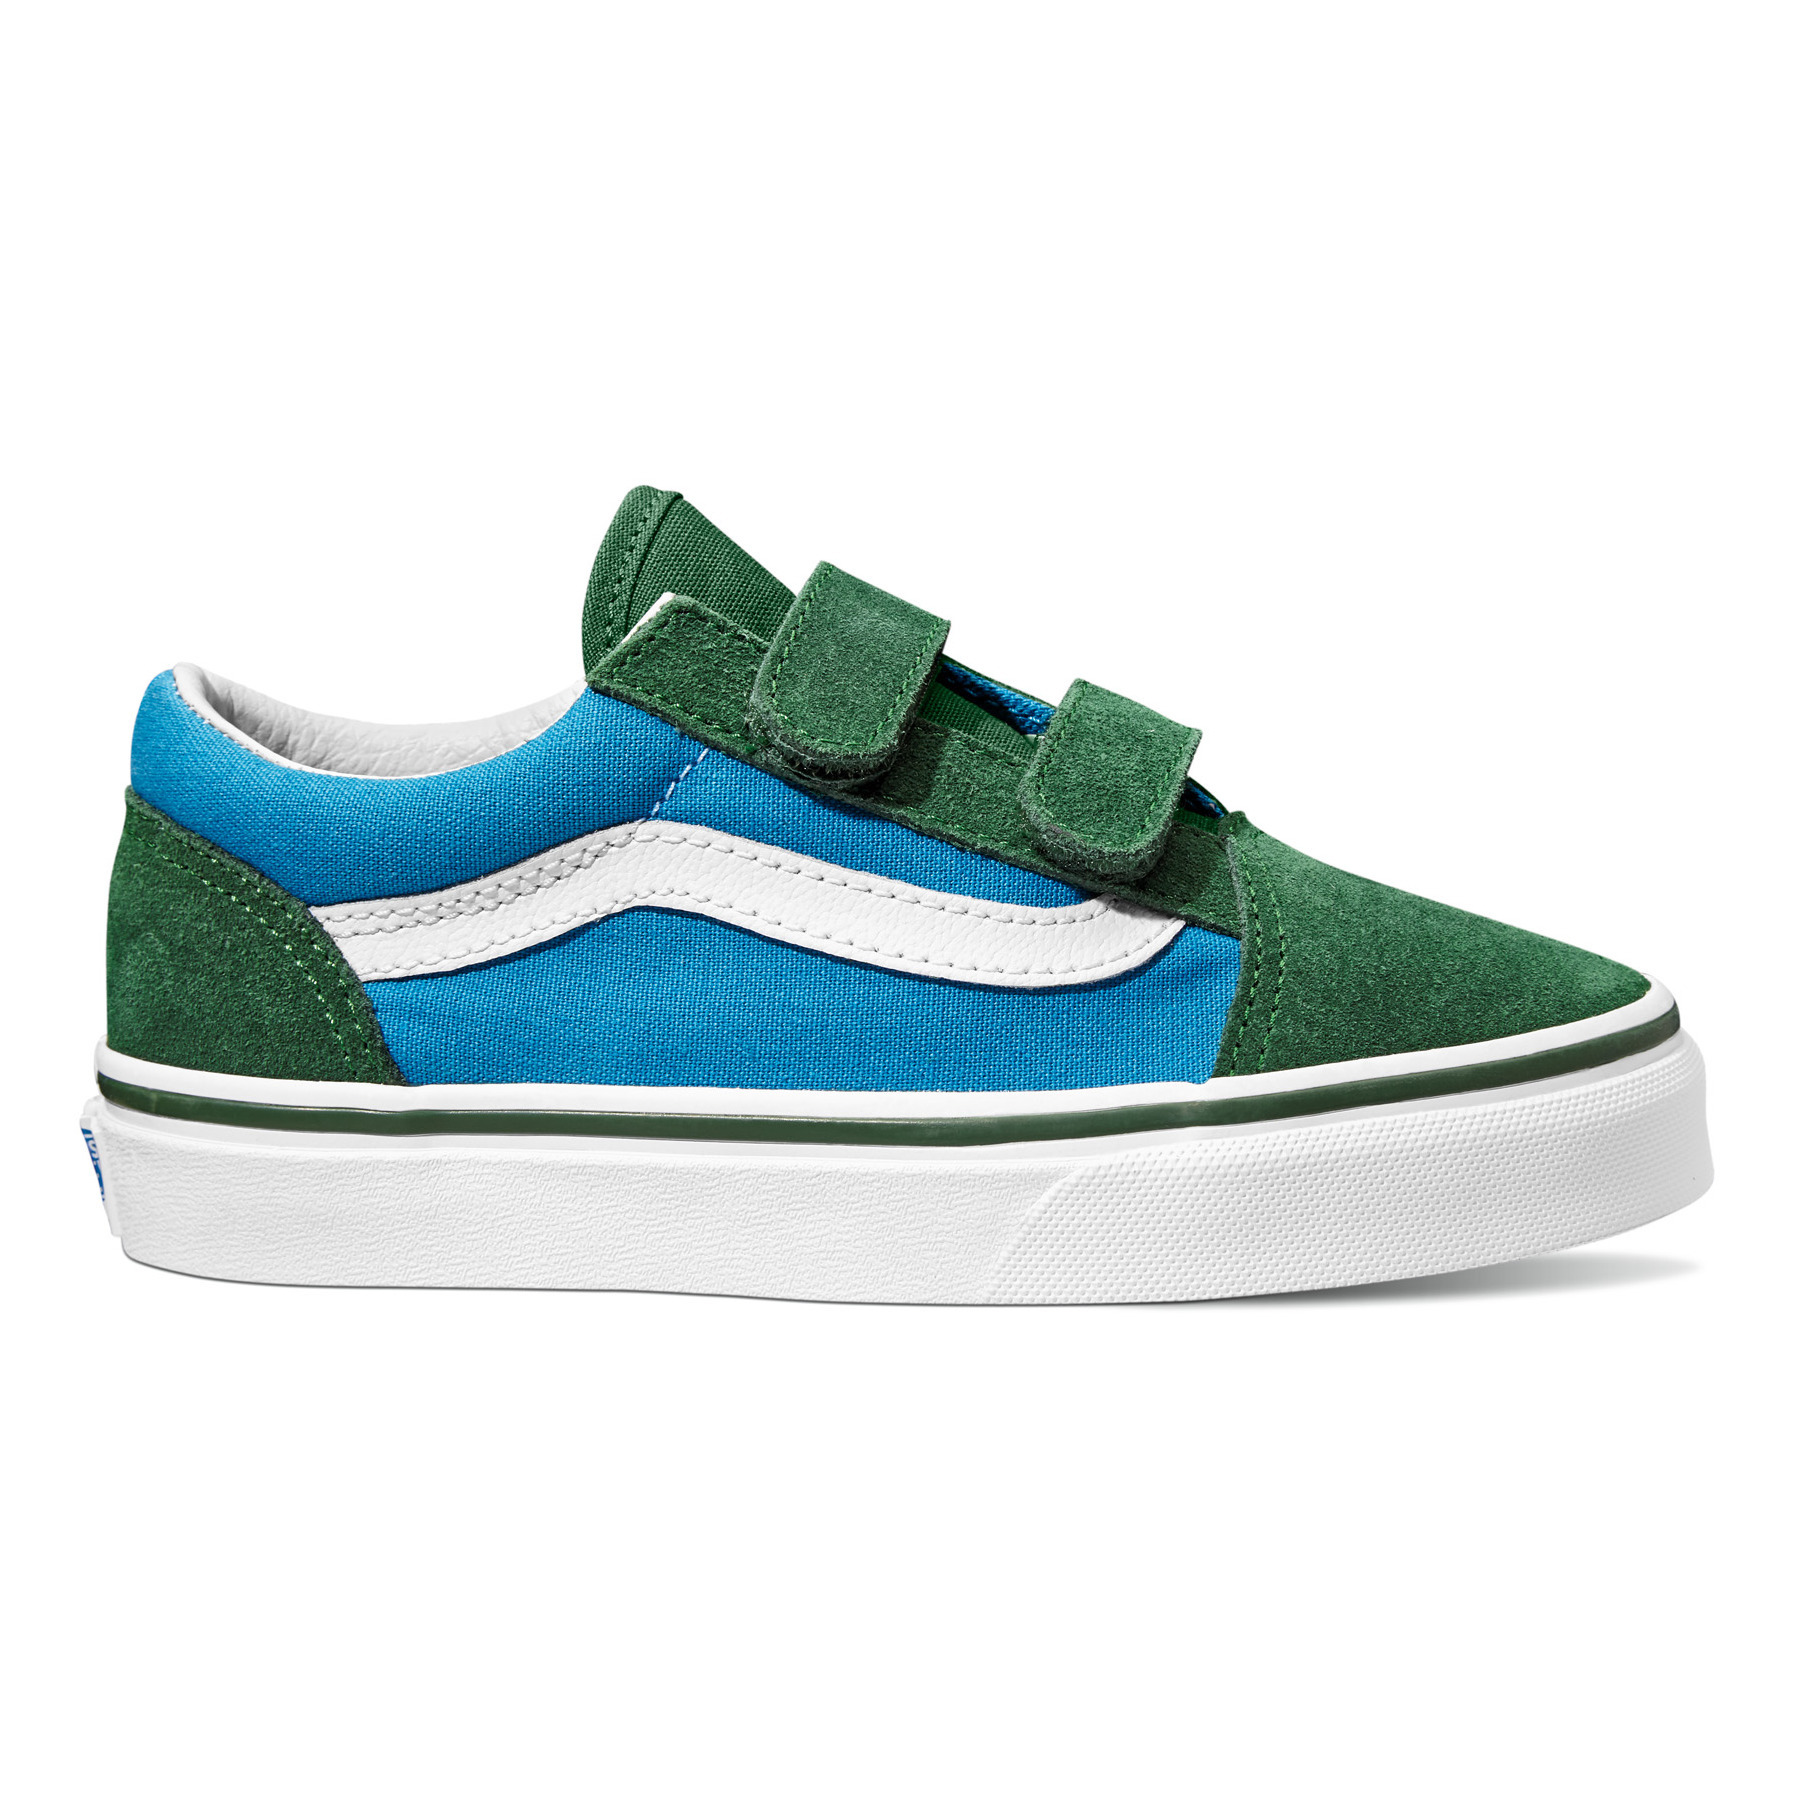 Vans old skool à lacets aqua shoes girl bonton